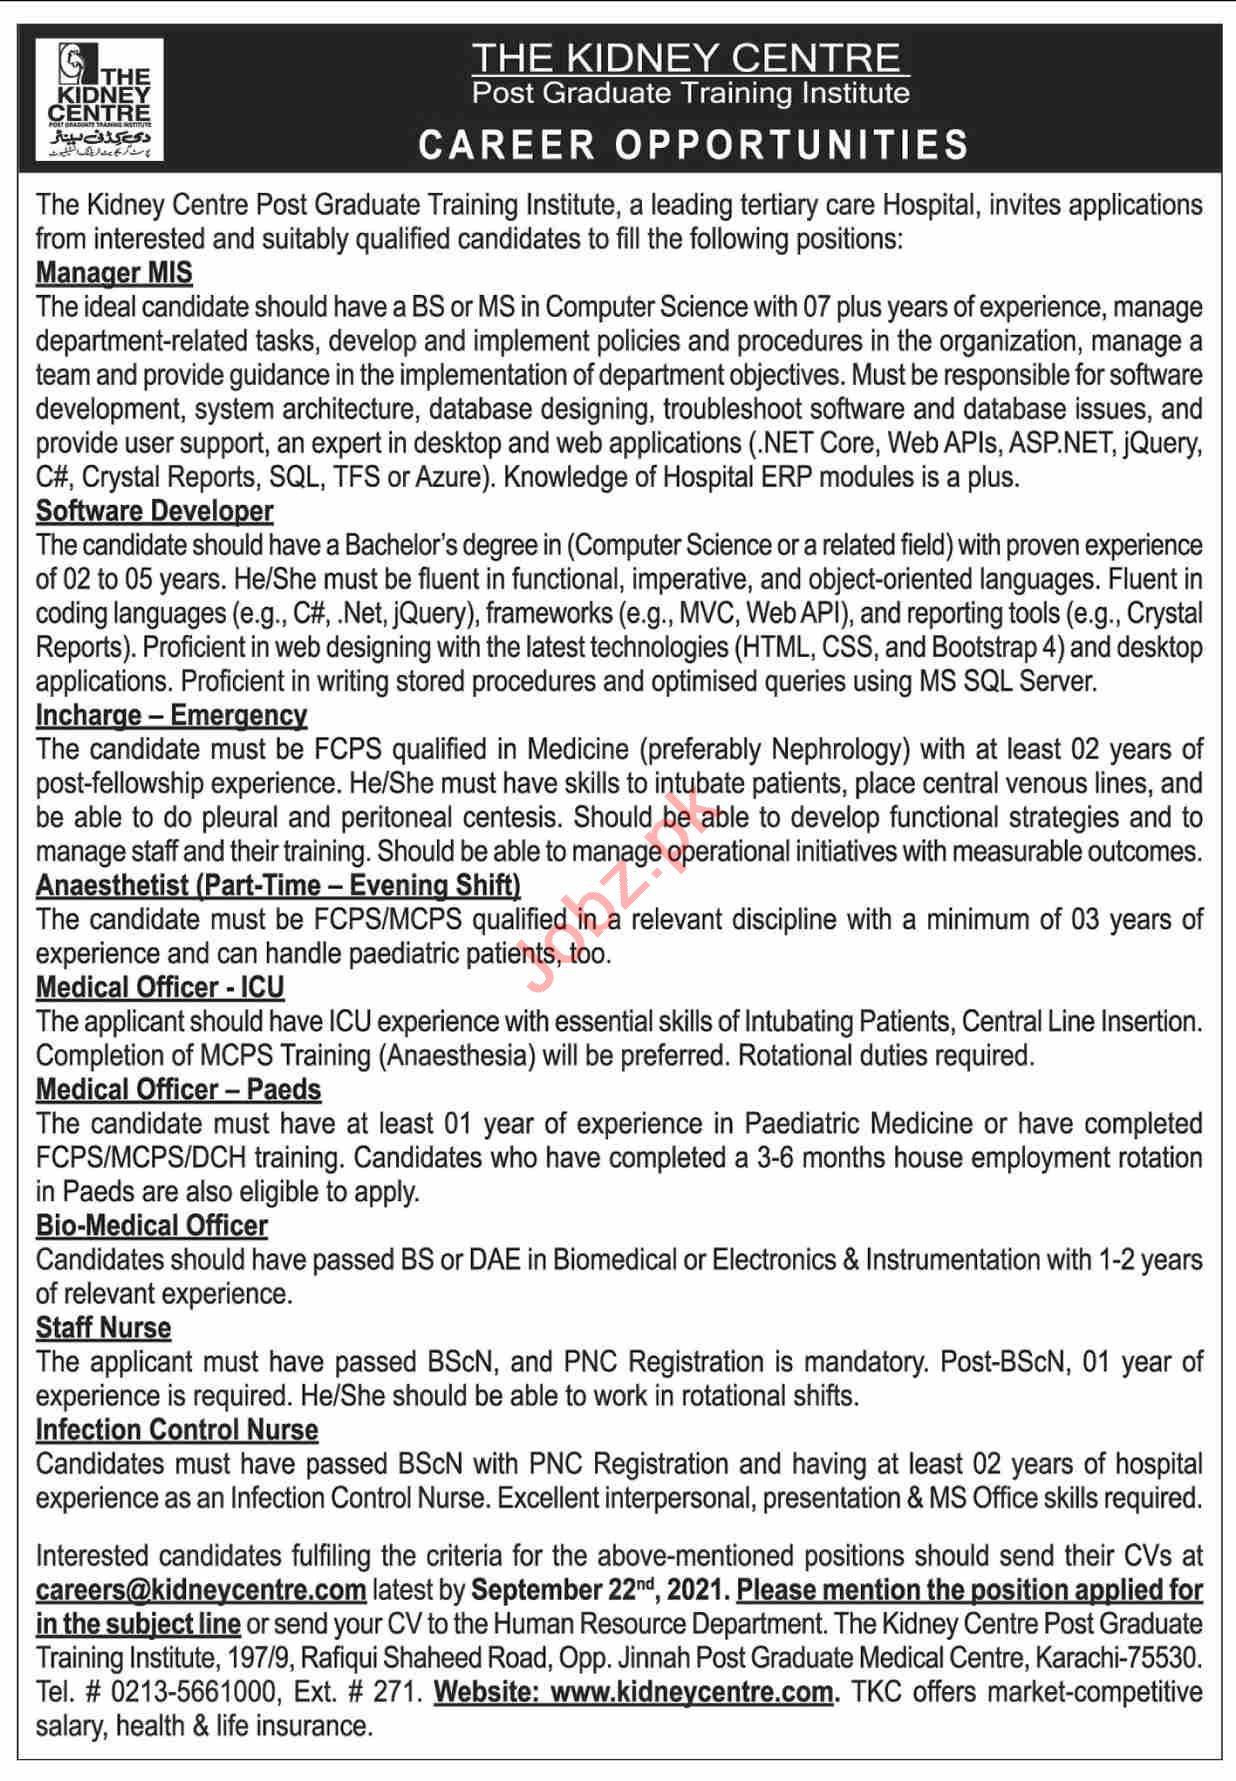 The Kidney Centre Post Graduate Training Institute Jobs 2021